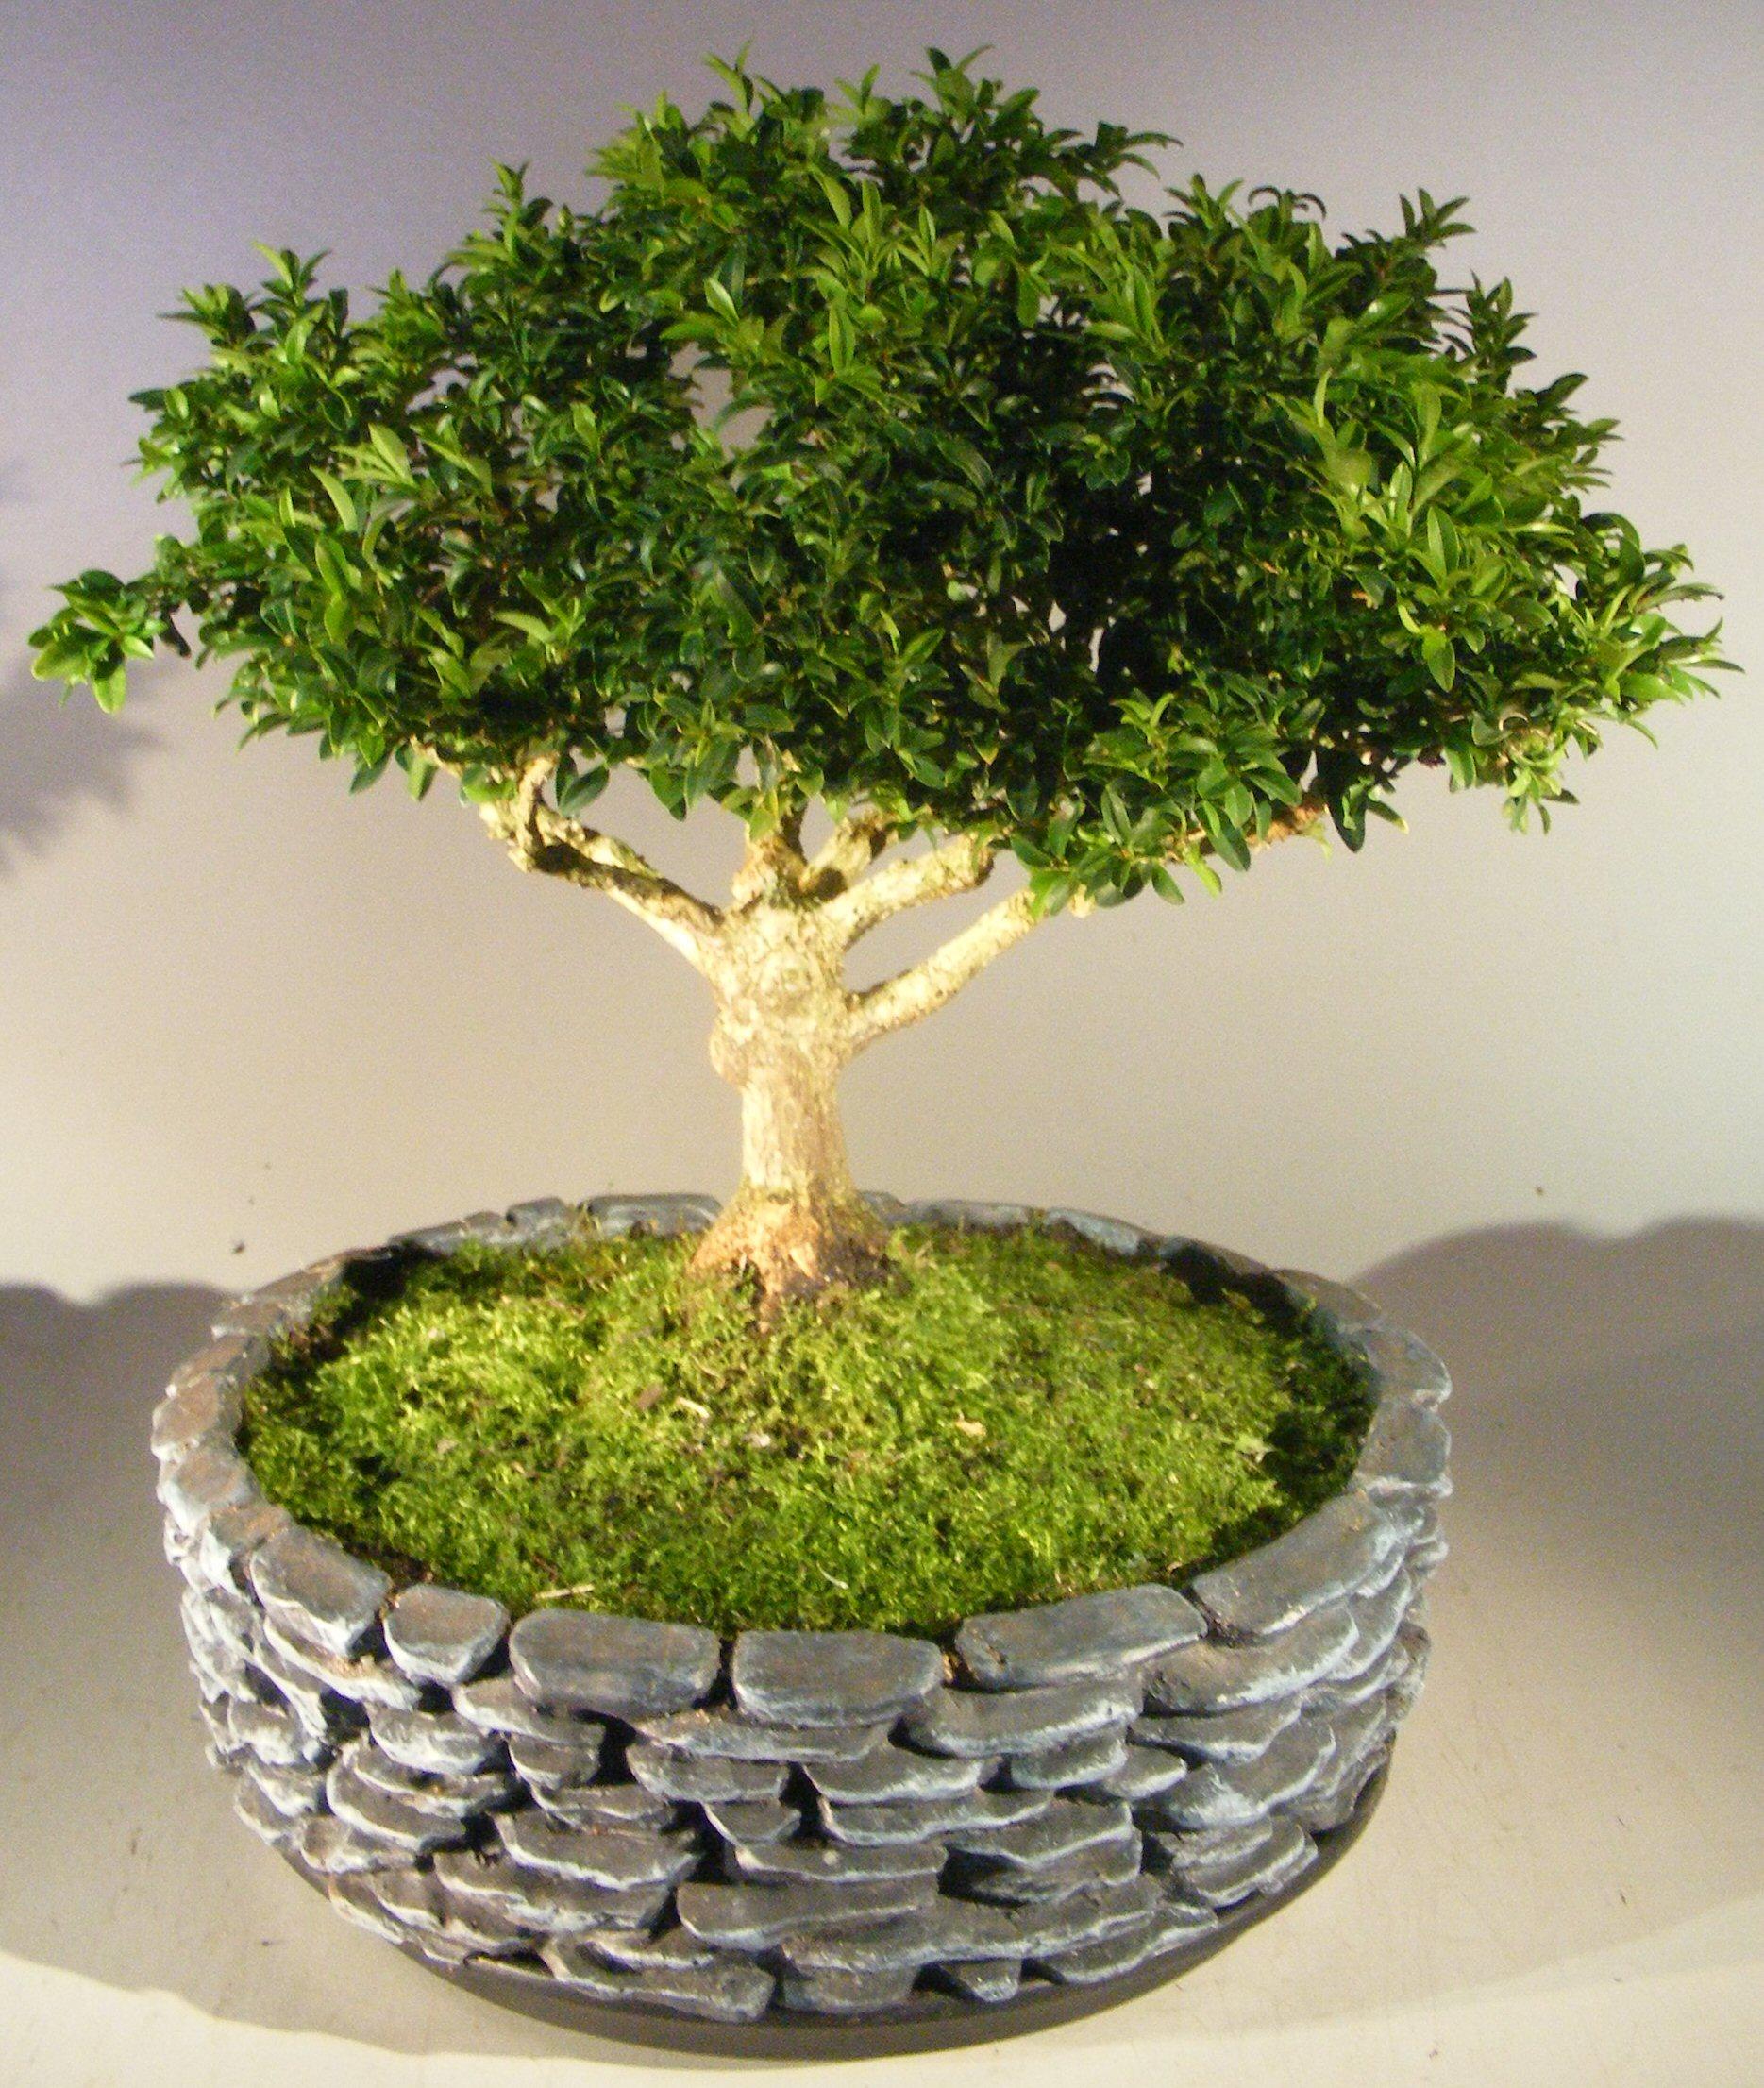 Japanese Kingsville Boxwood Bonsai Tree Buxus Microphylla Compacta